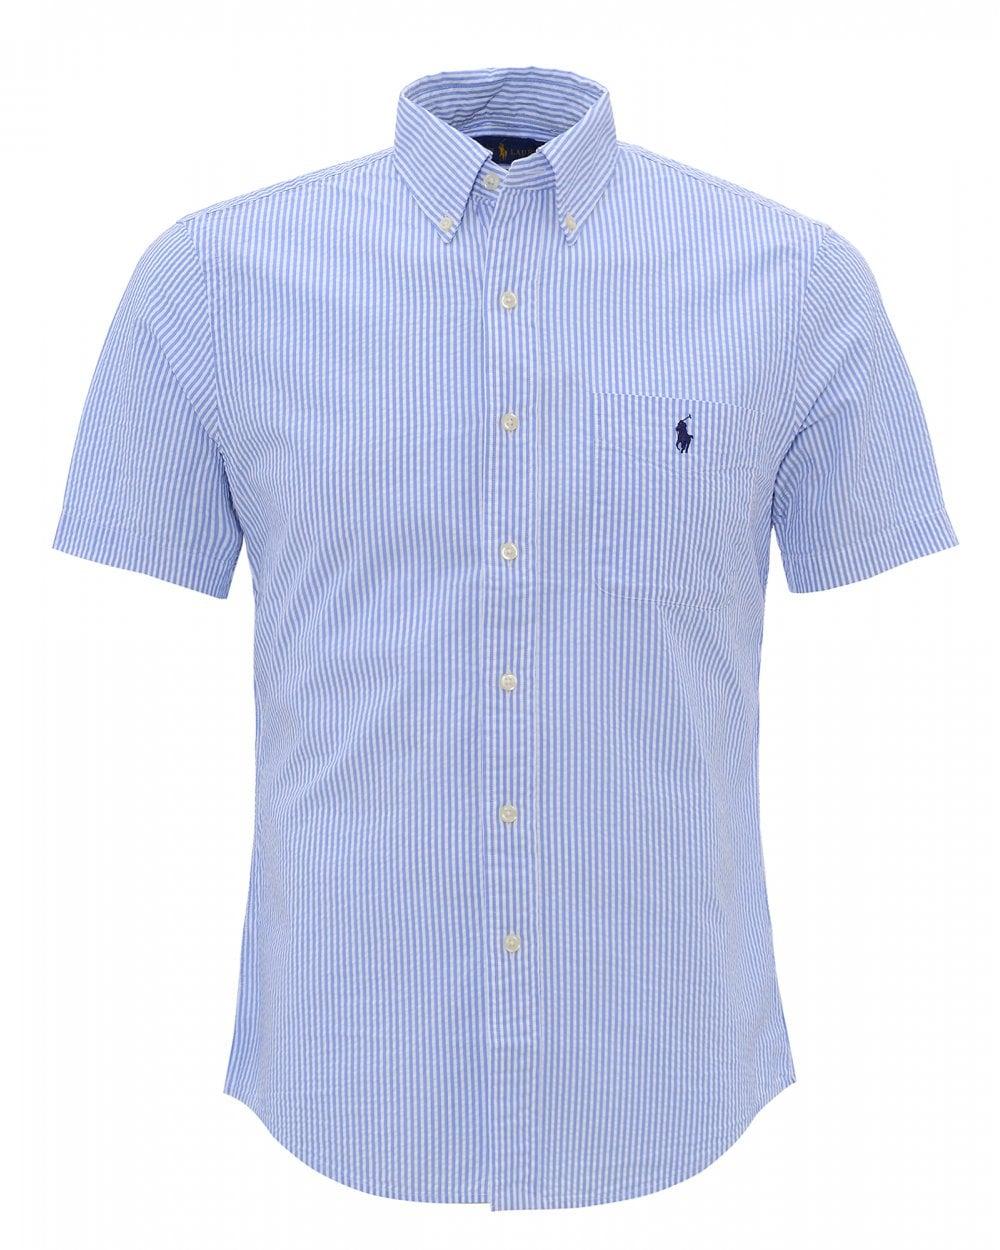 0d4c4701 Ralph Lauren Mens Blue Striped Seersucker Slim Fit Pocket Shirt